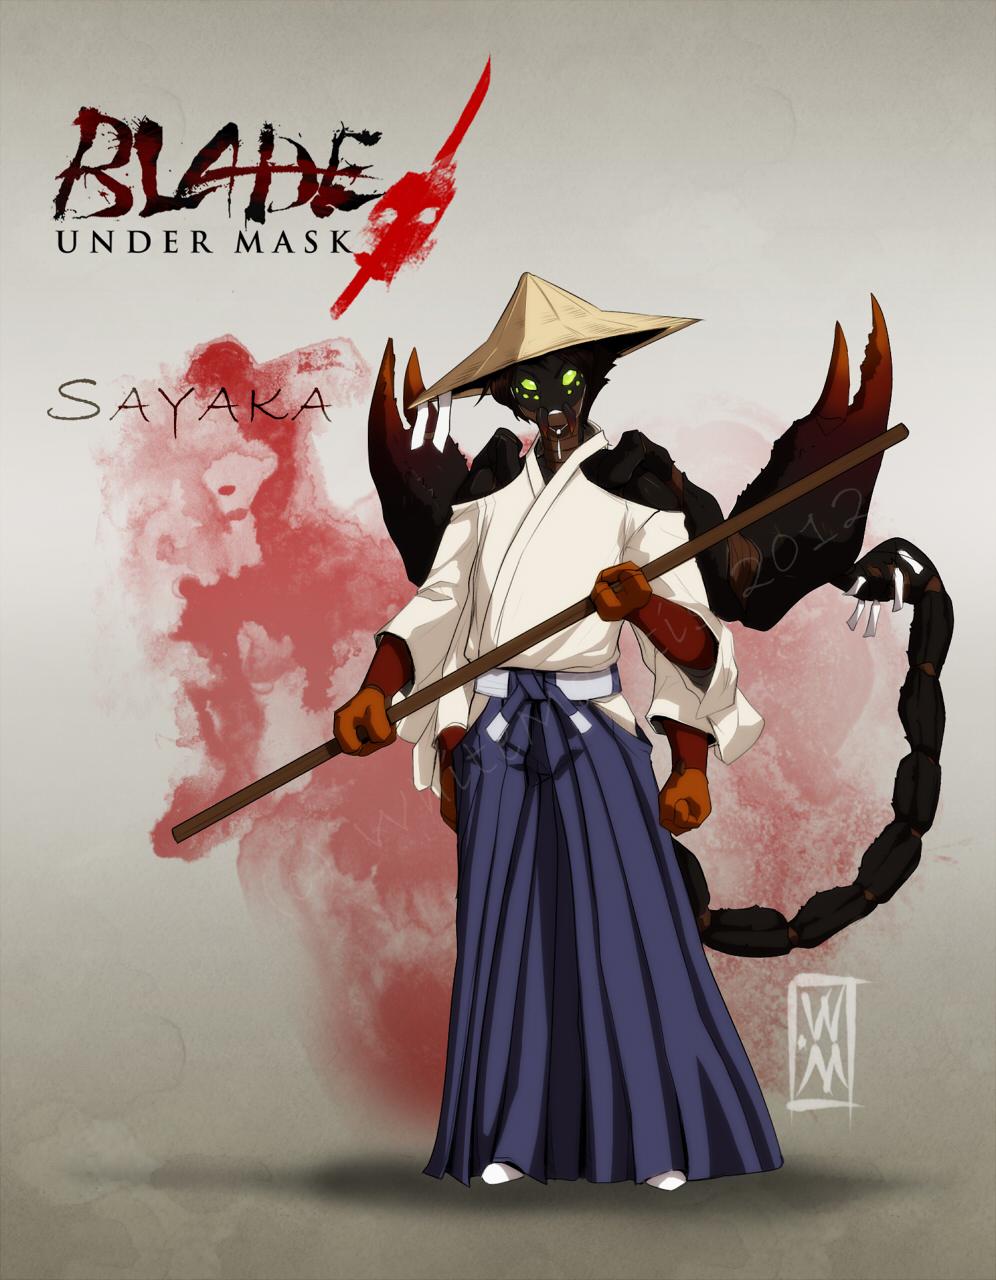 Blade Under Mask: Sayaka